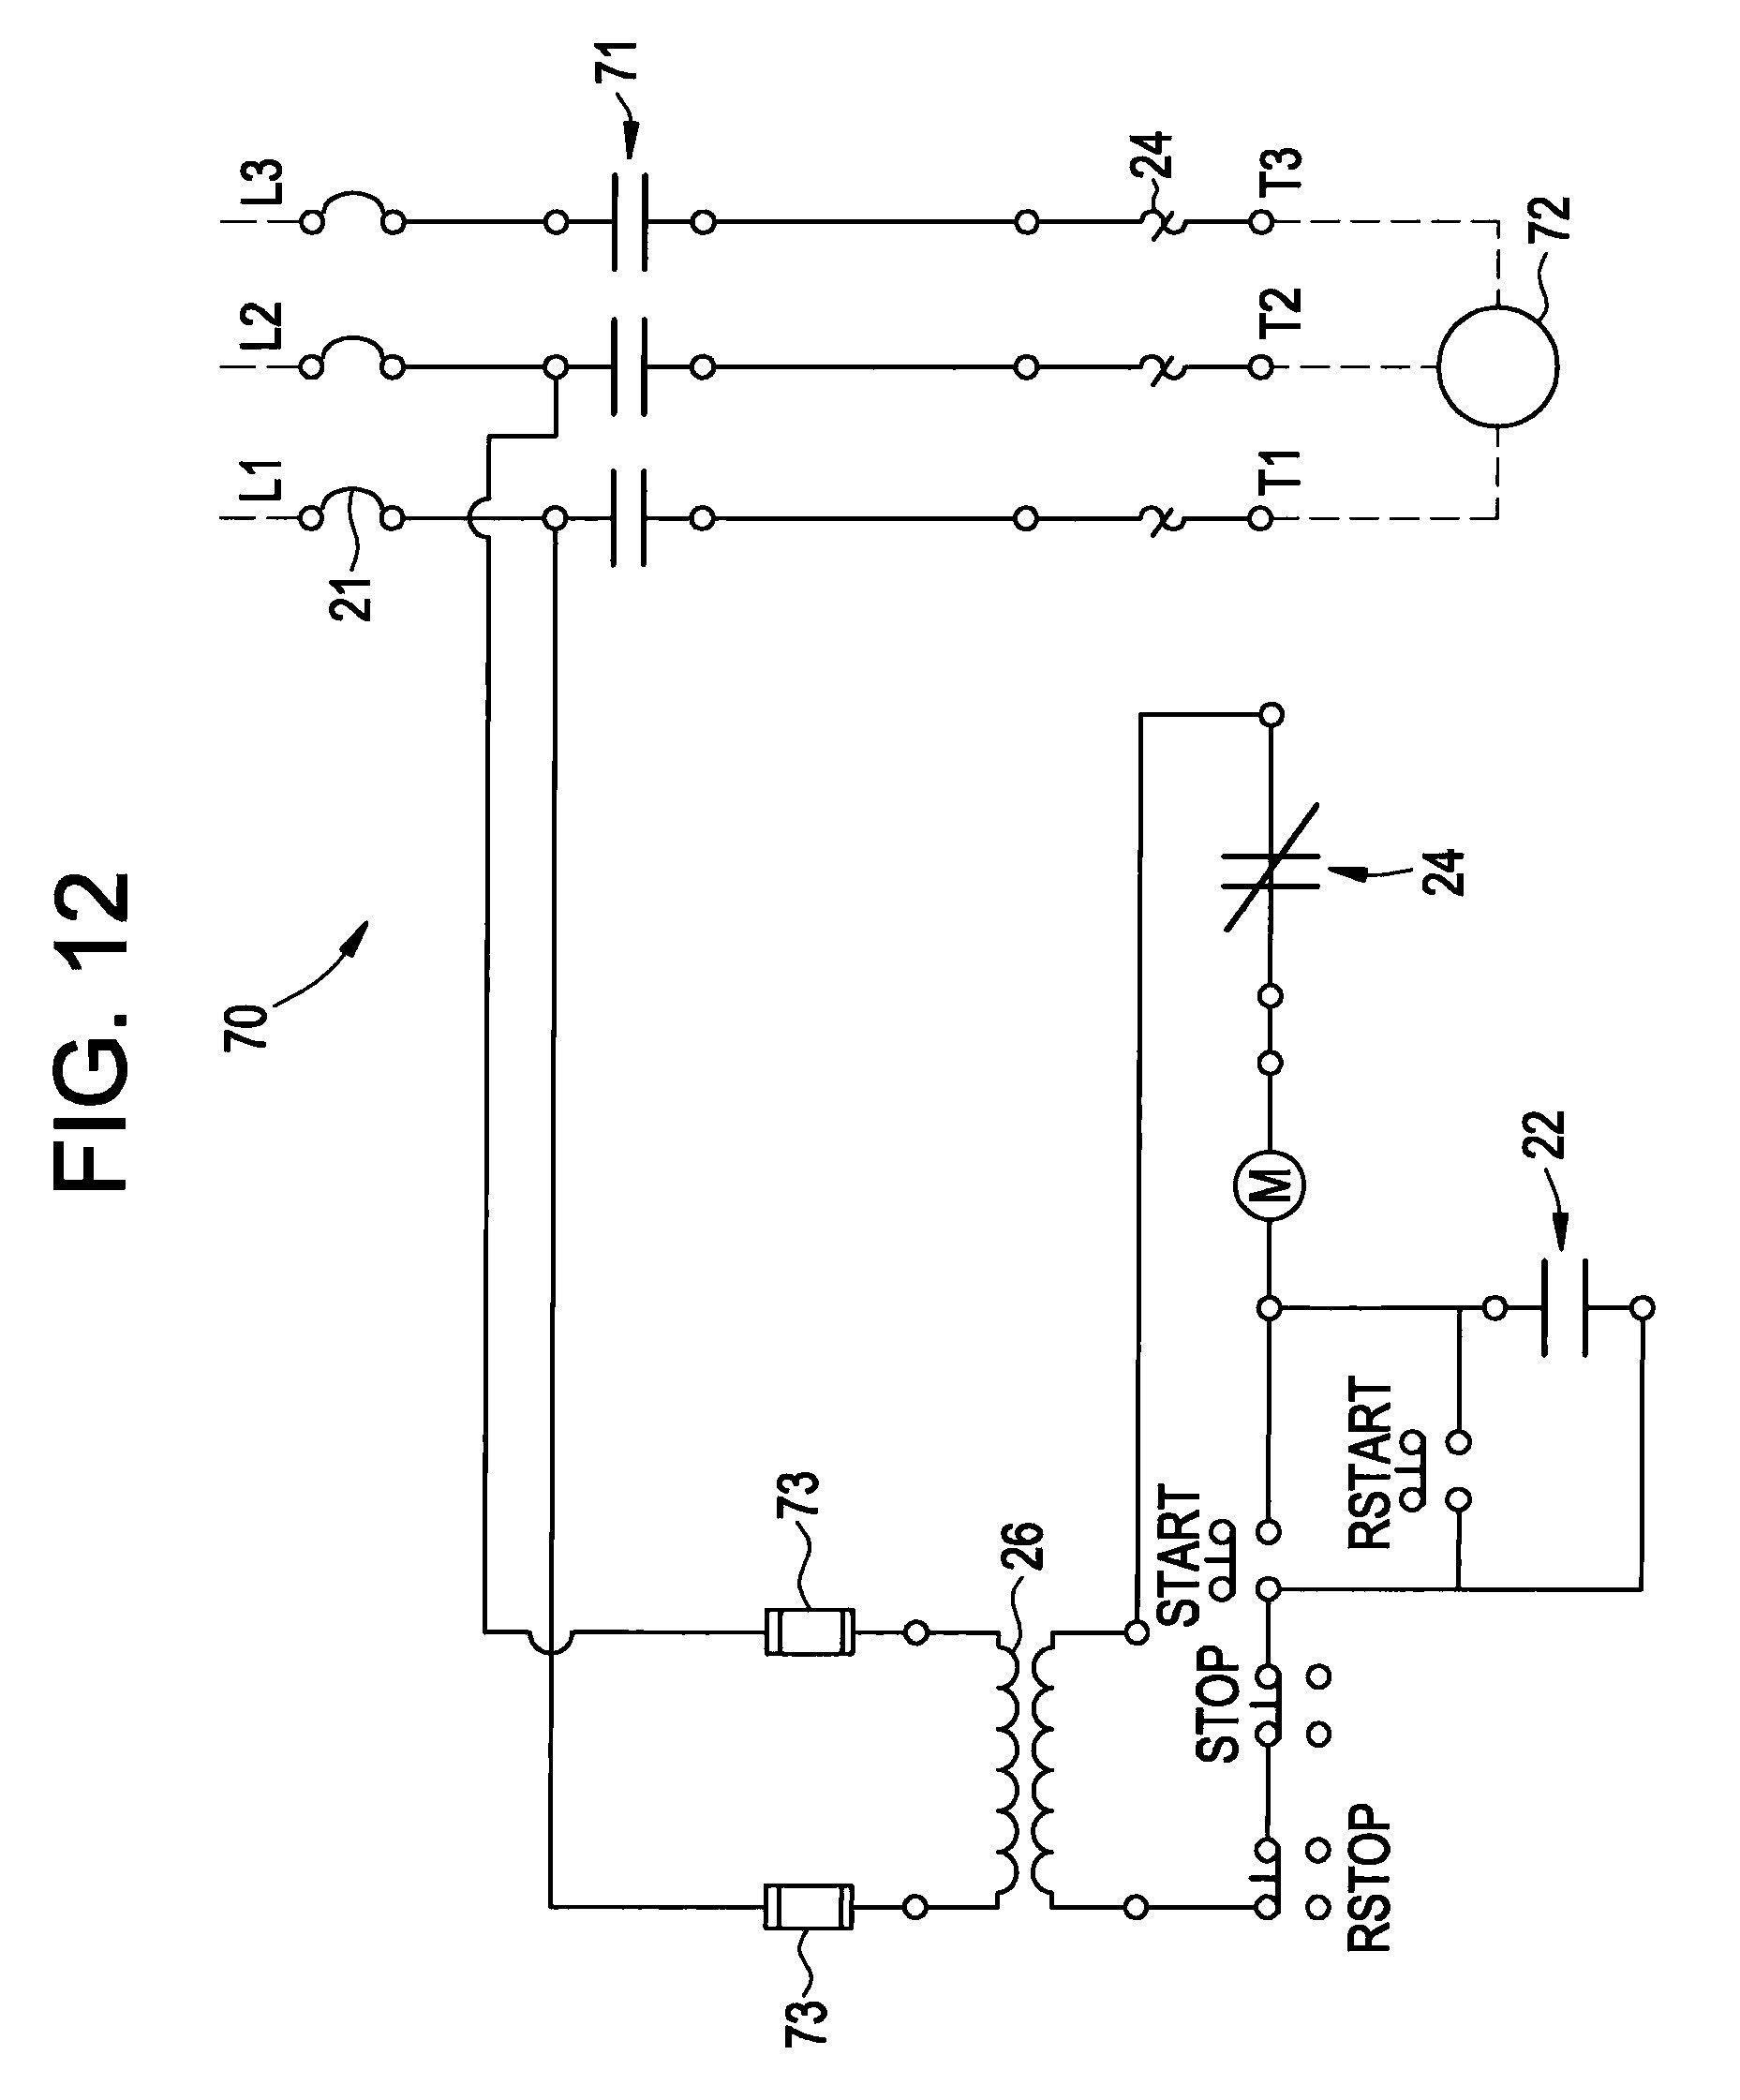 new wiring diagram for auto transformers diagram diagramtemplate diagramsample [ 1857 x 2241 Pixel ]